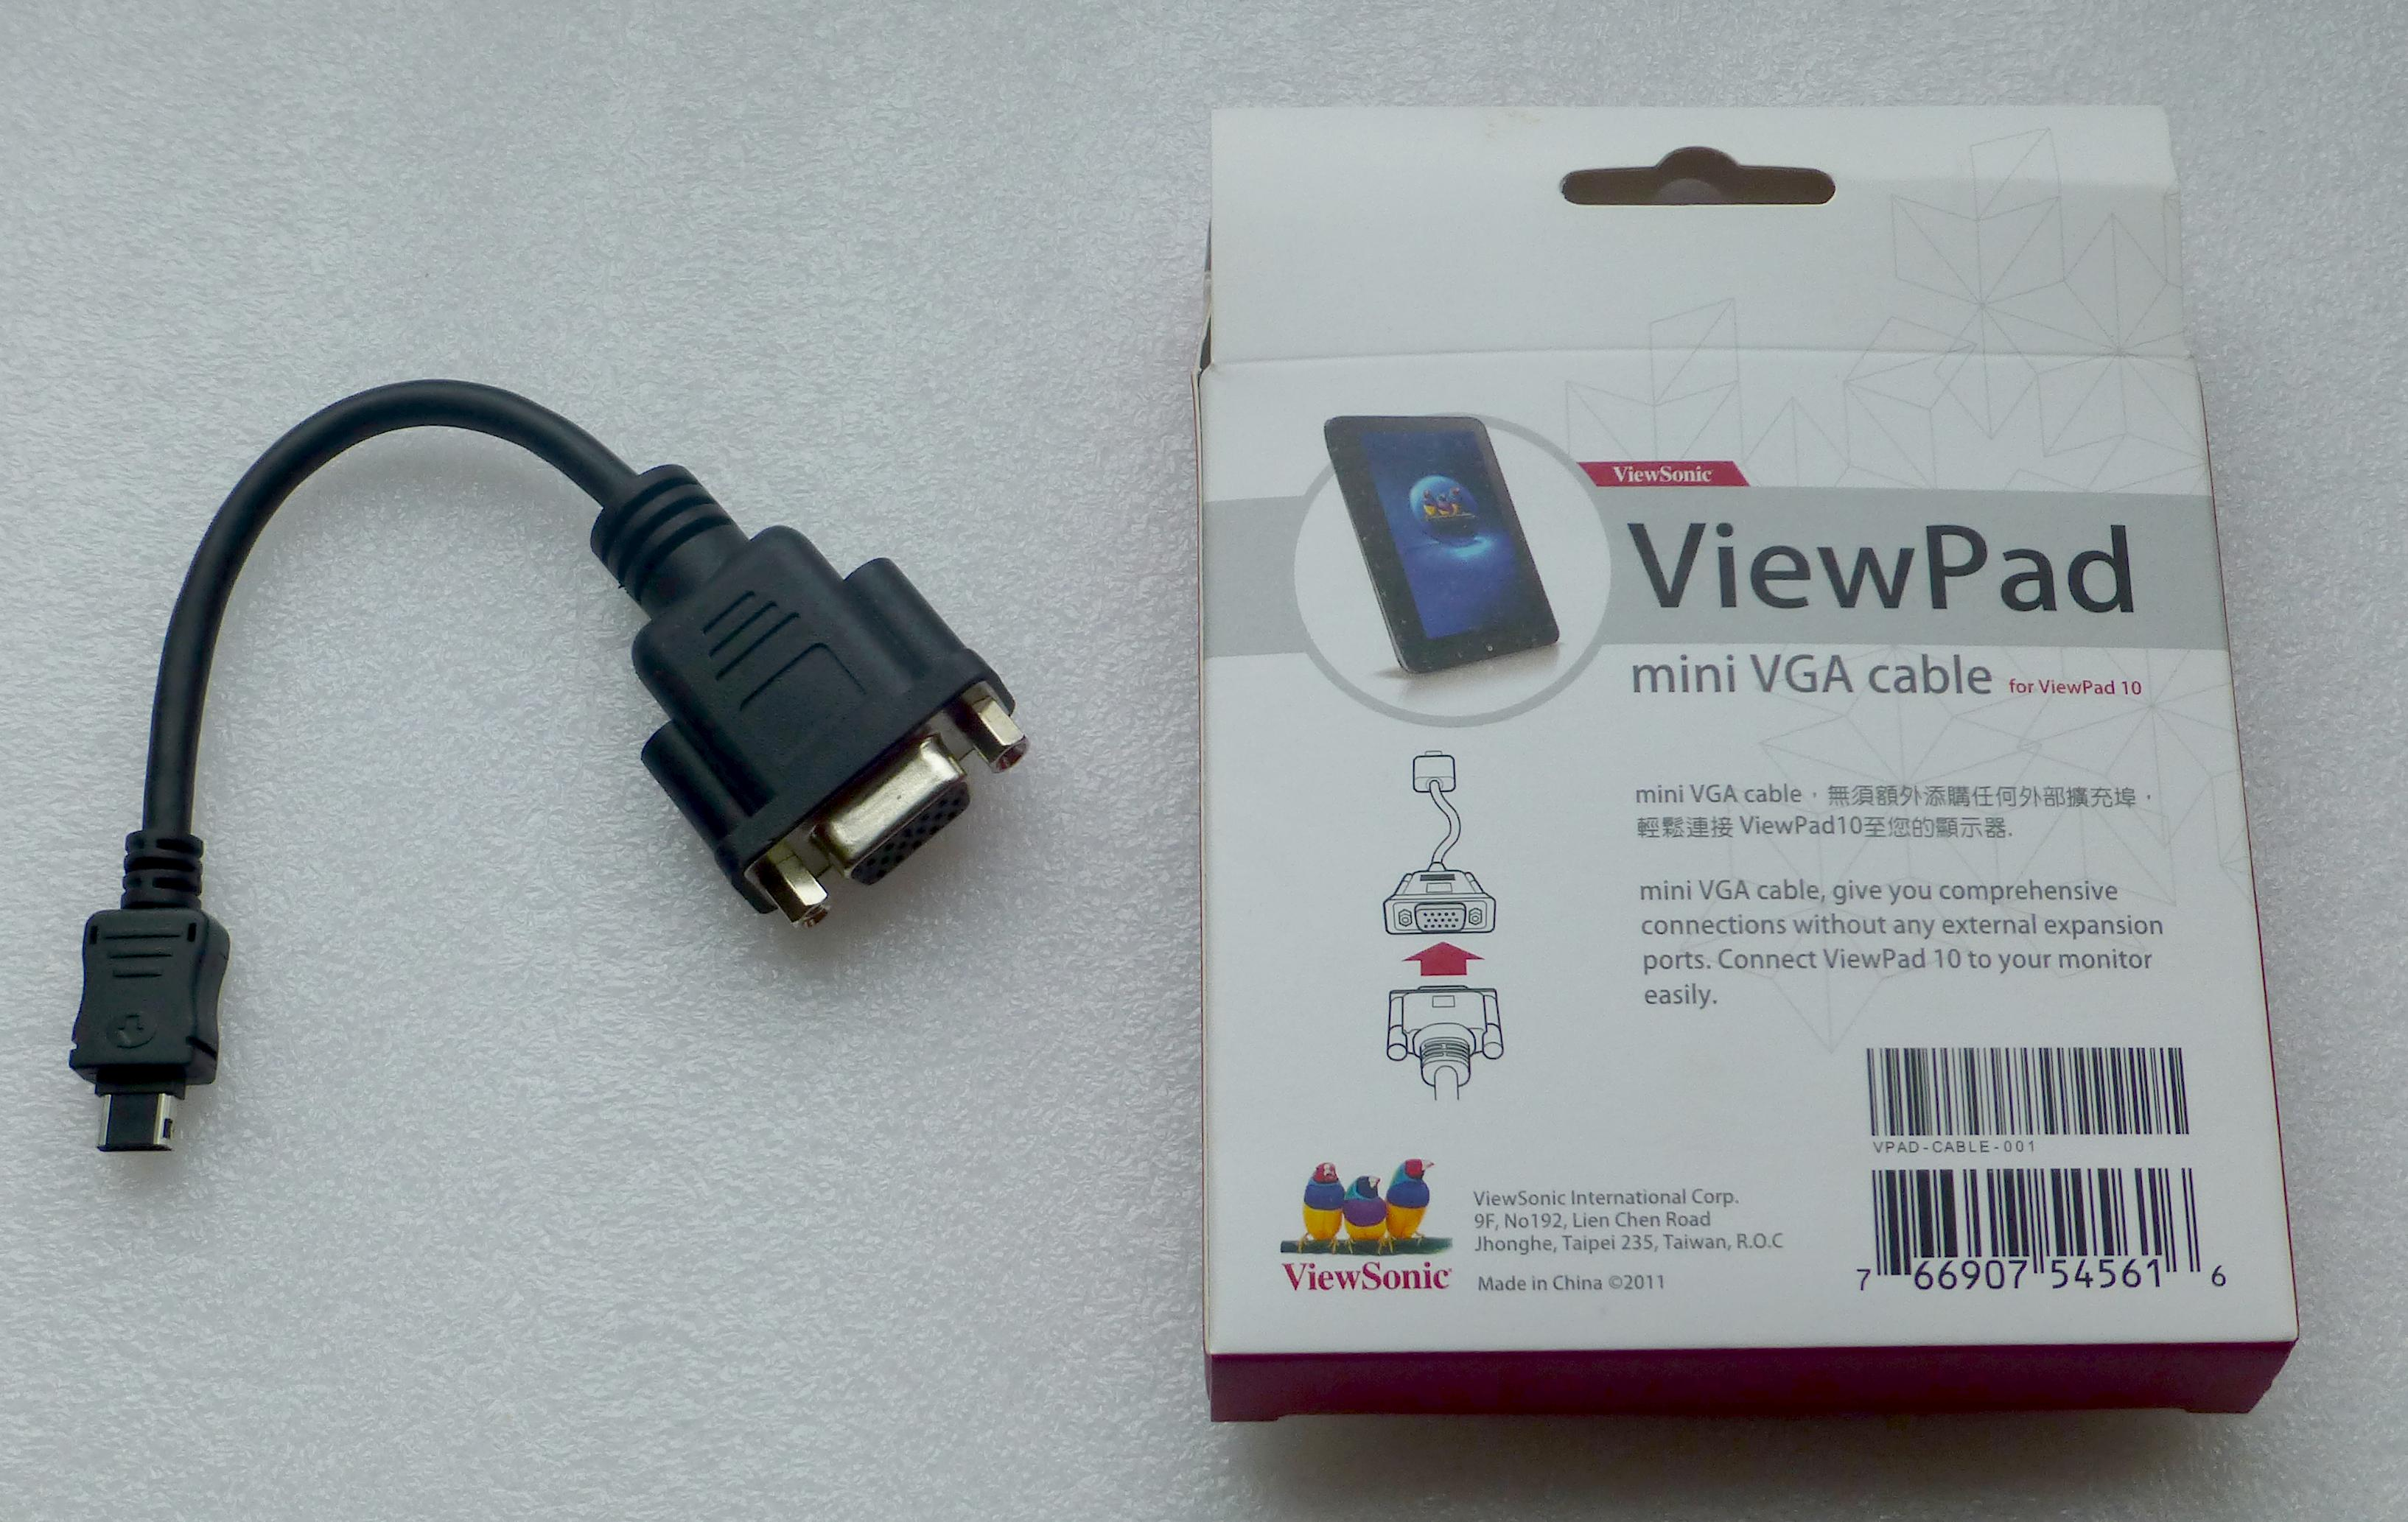 viewpad mini vga kabel f r viewpad 10 neuware ebay. Black Bedroom Furniture Sets. Home Design Ideas